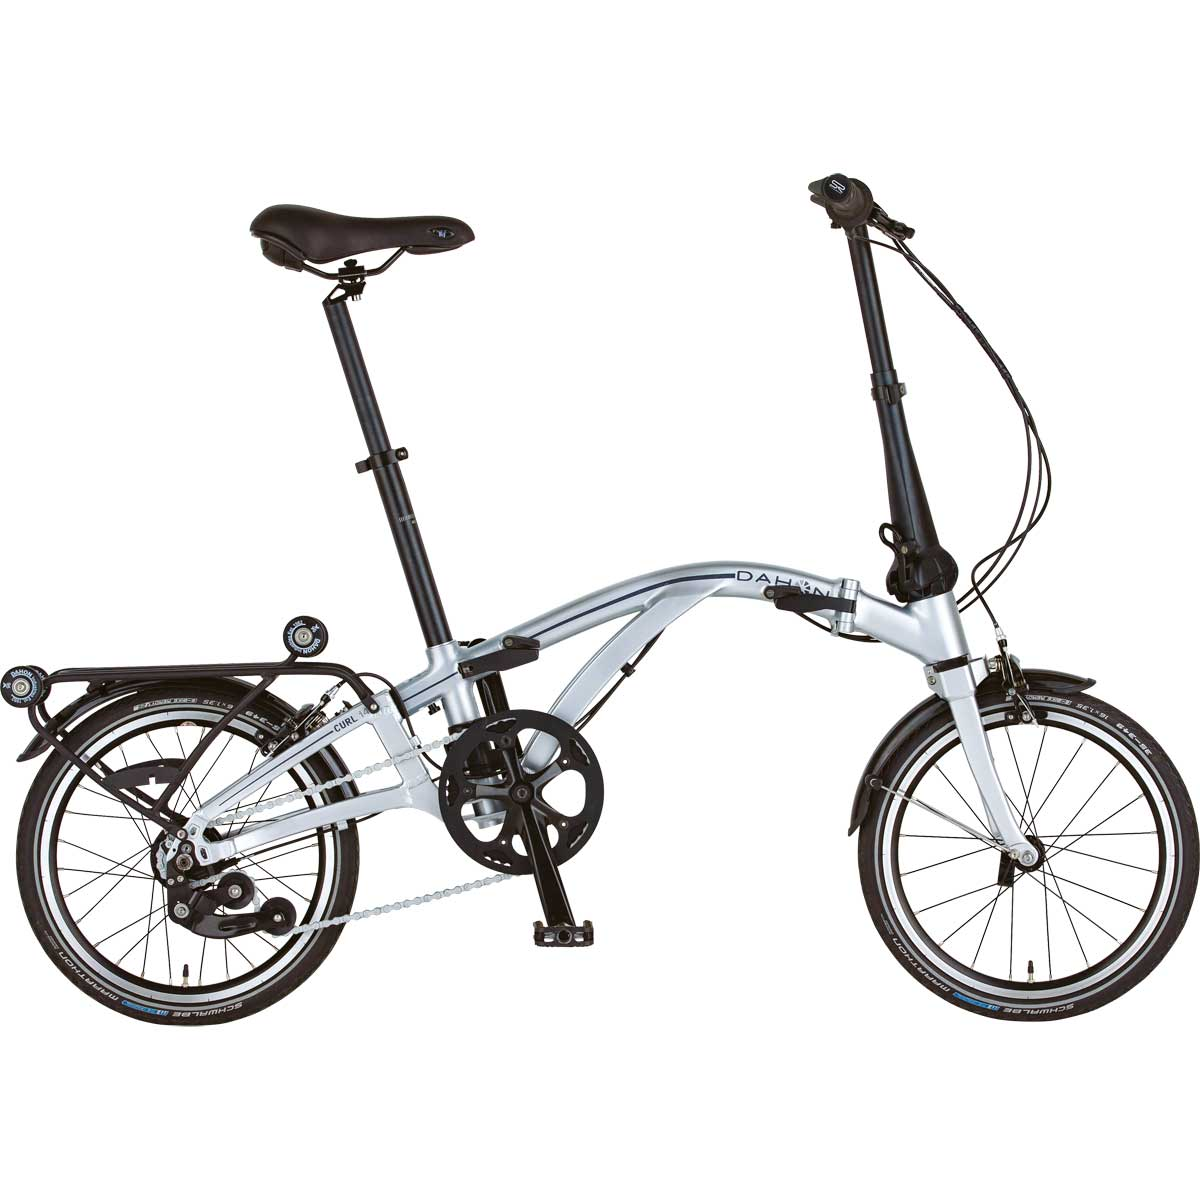 DAHON/ダホンCurli4カールi4クローム(9038)折りたたみ自転車自転車本体キャリー